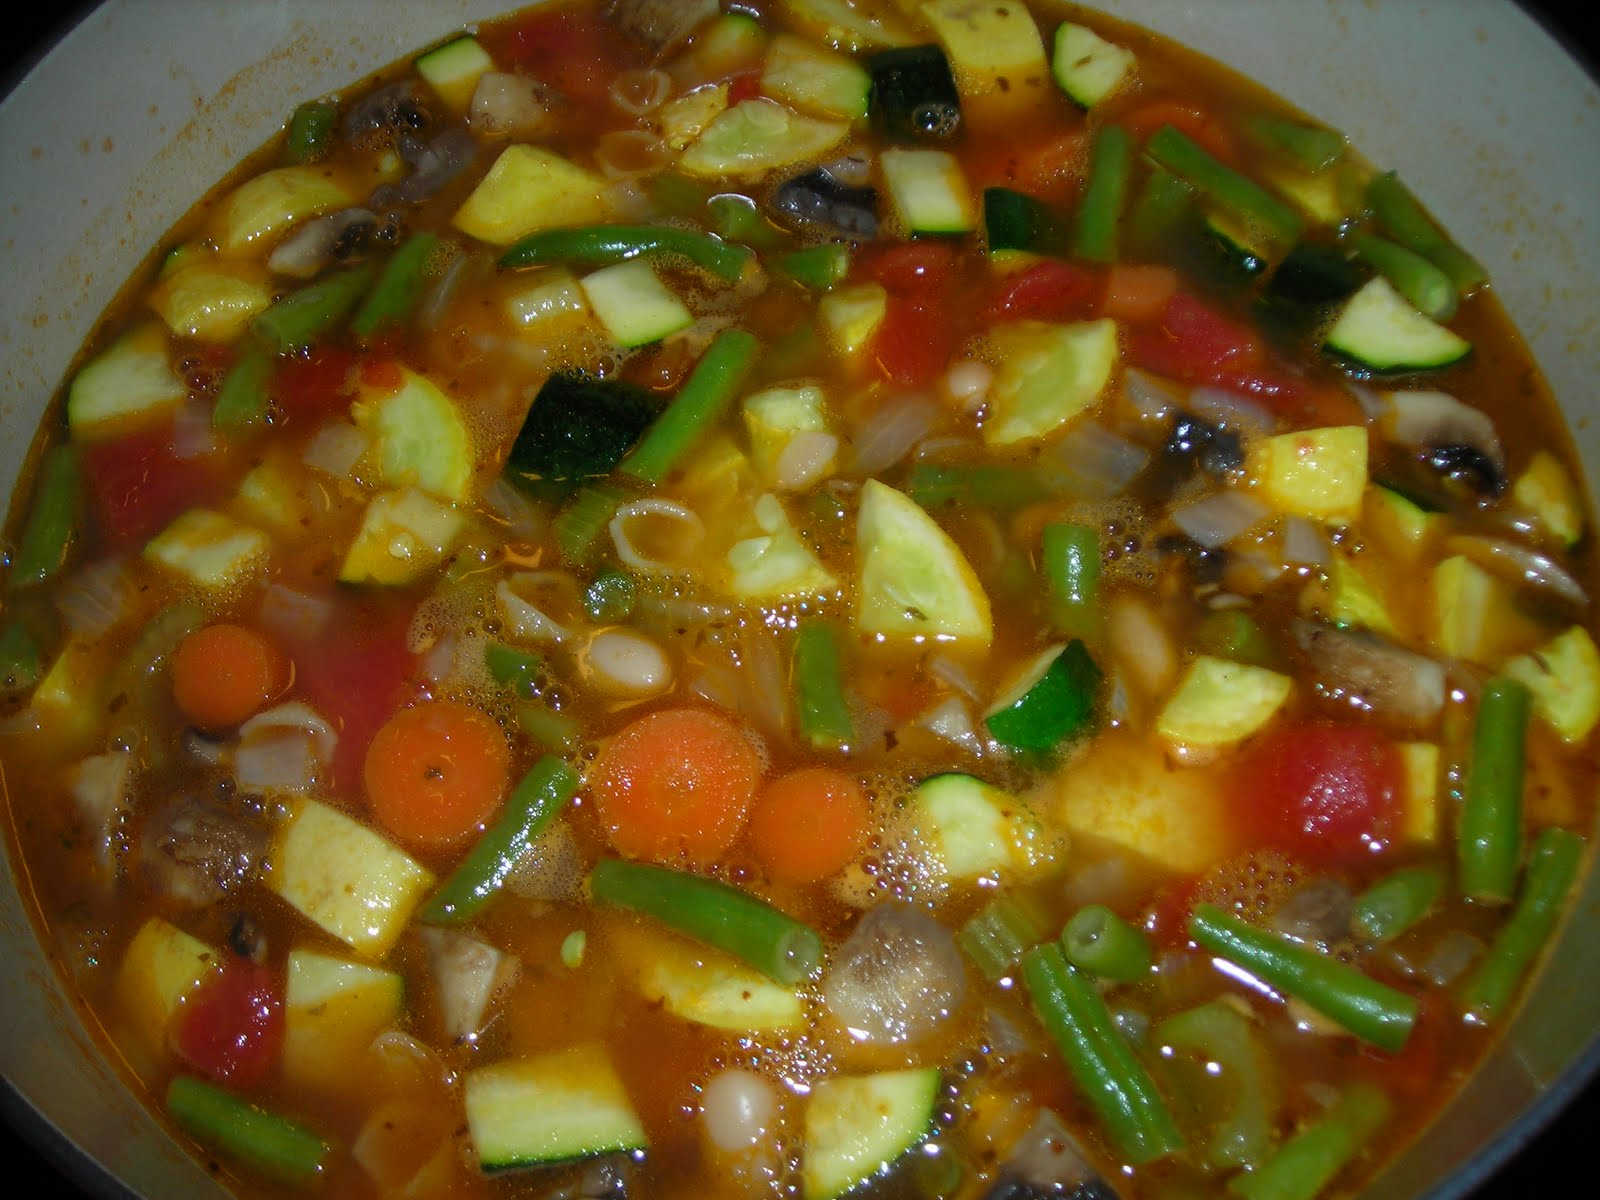 Jodie's Weekend Warm-Ups: Roasted Vegetable Minestrone Soup